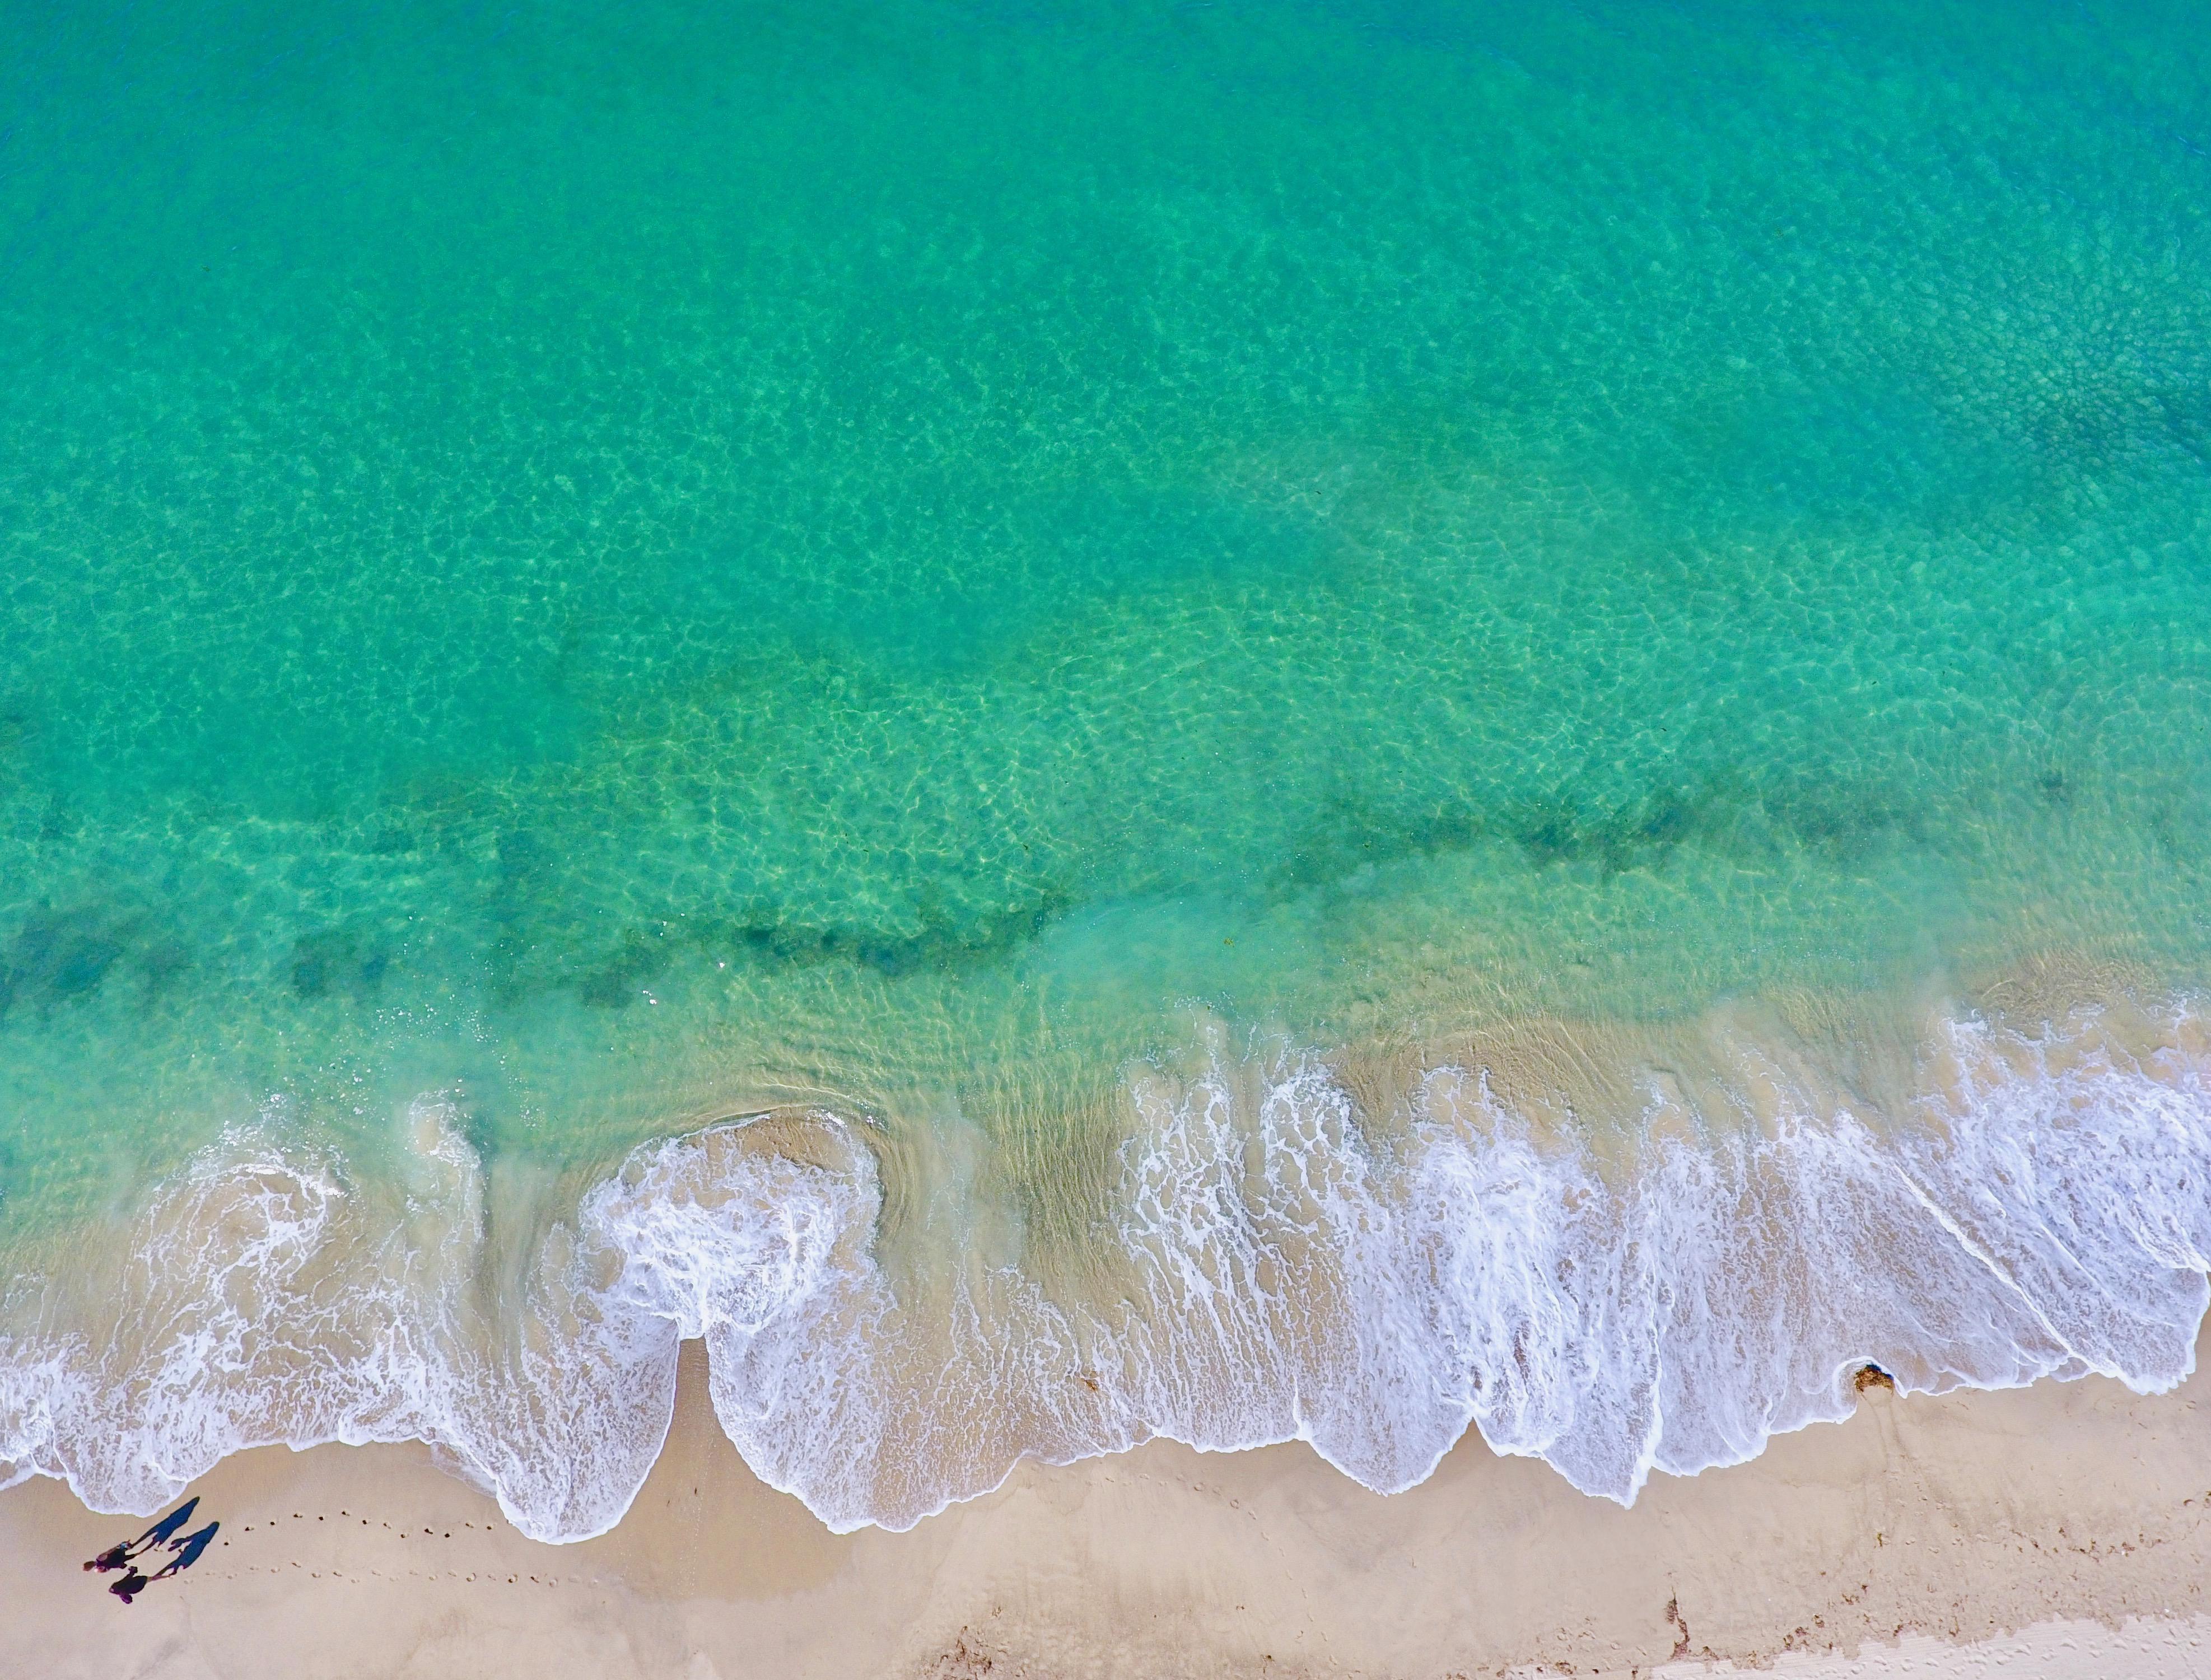 Aqua water drone